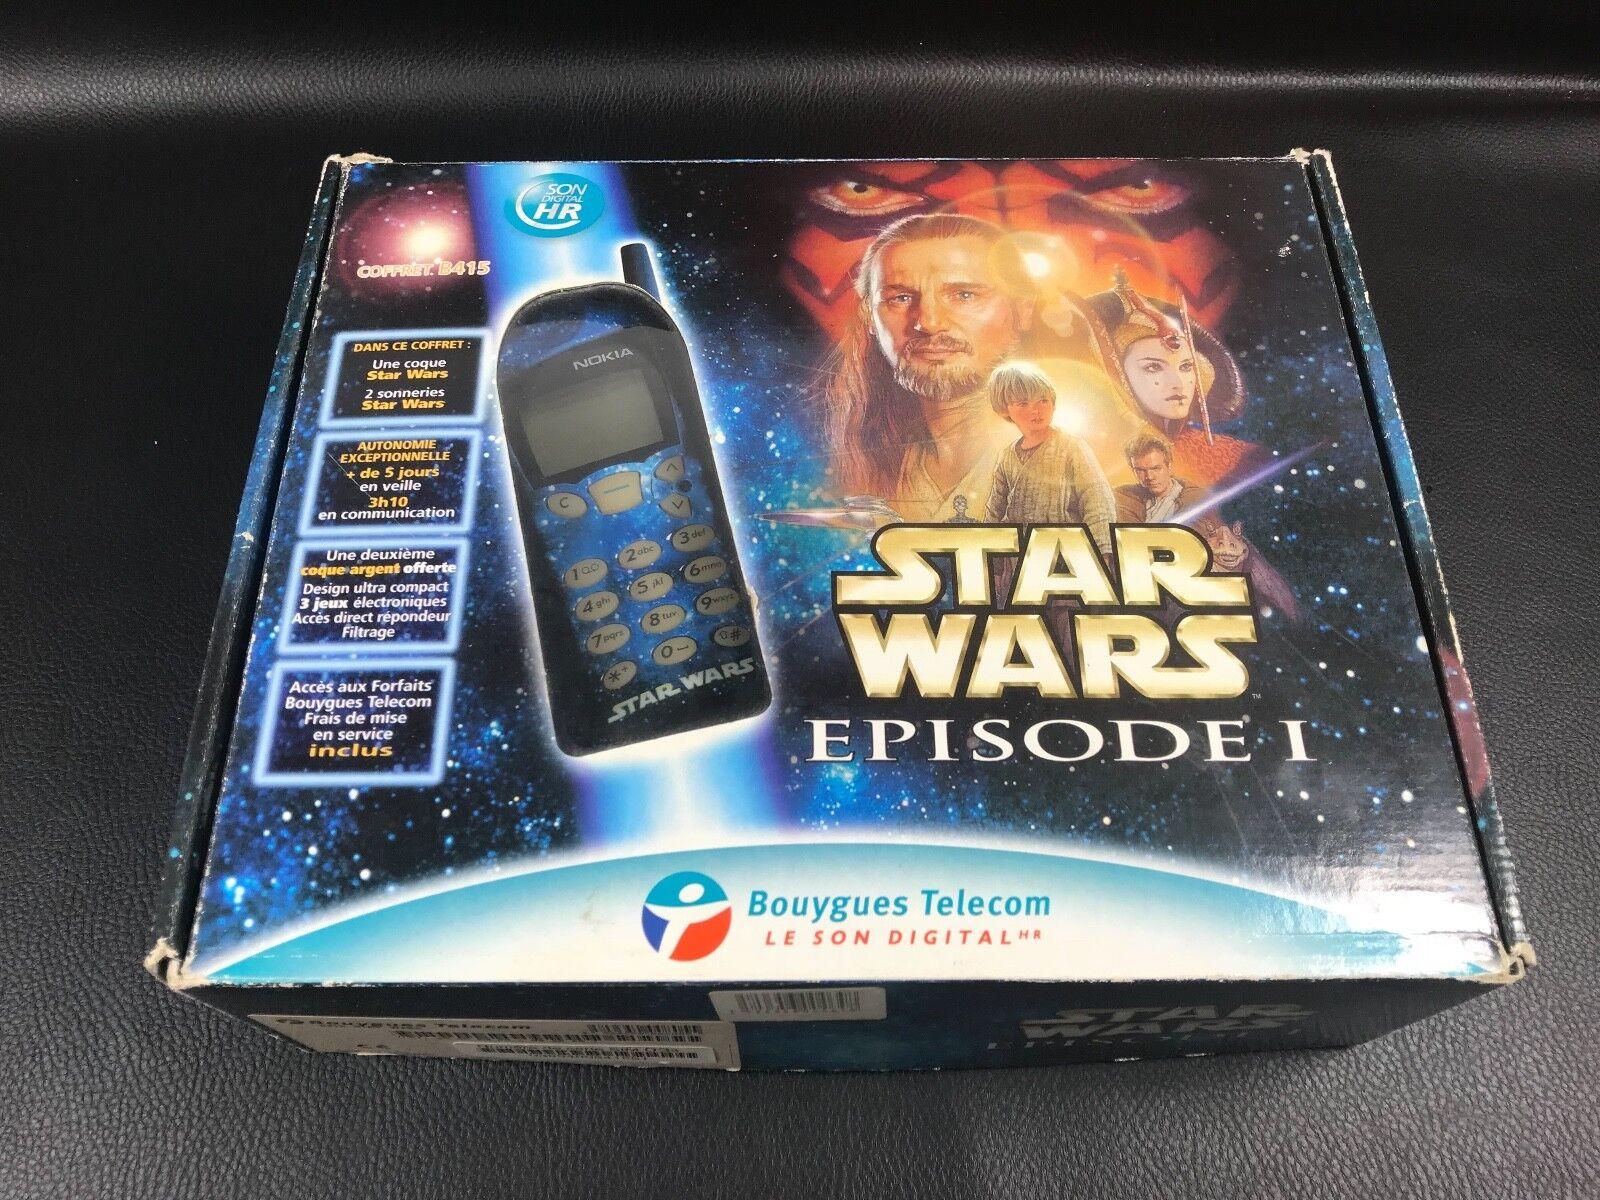 TÉLÉPHONE MOBILE NOKIA 5130 TELECOM B415 COFFRET STAR WARS